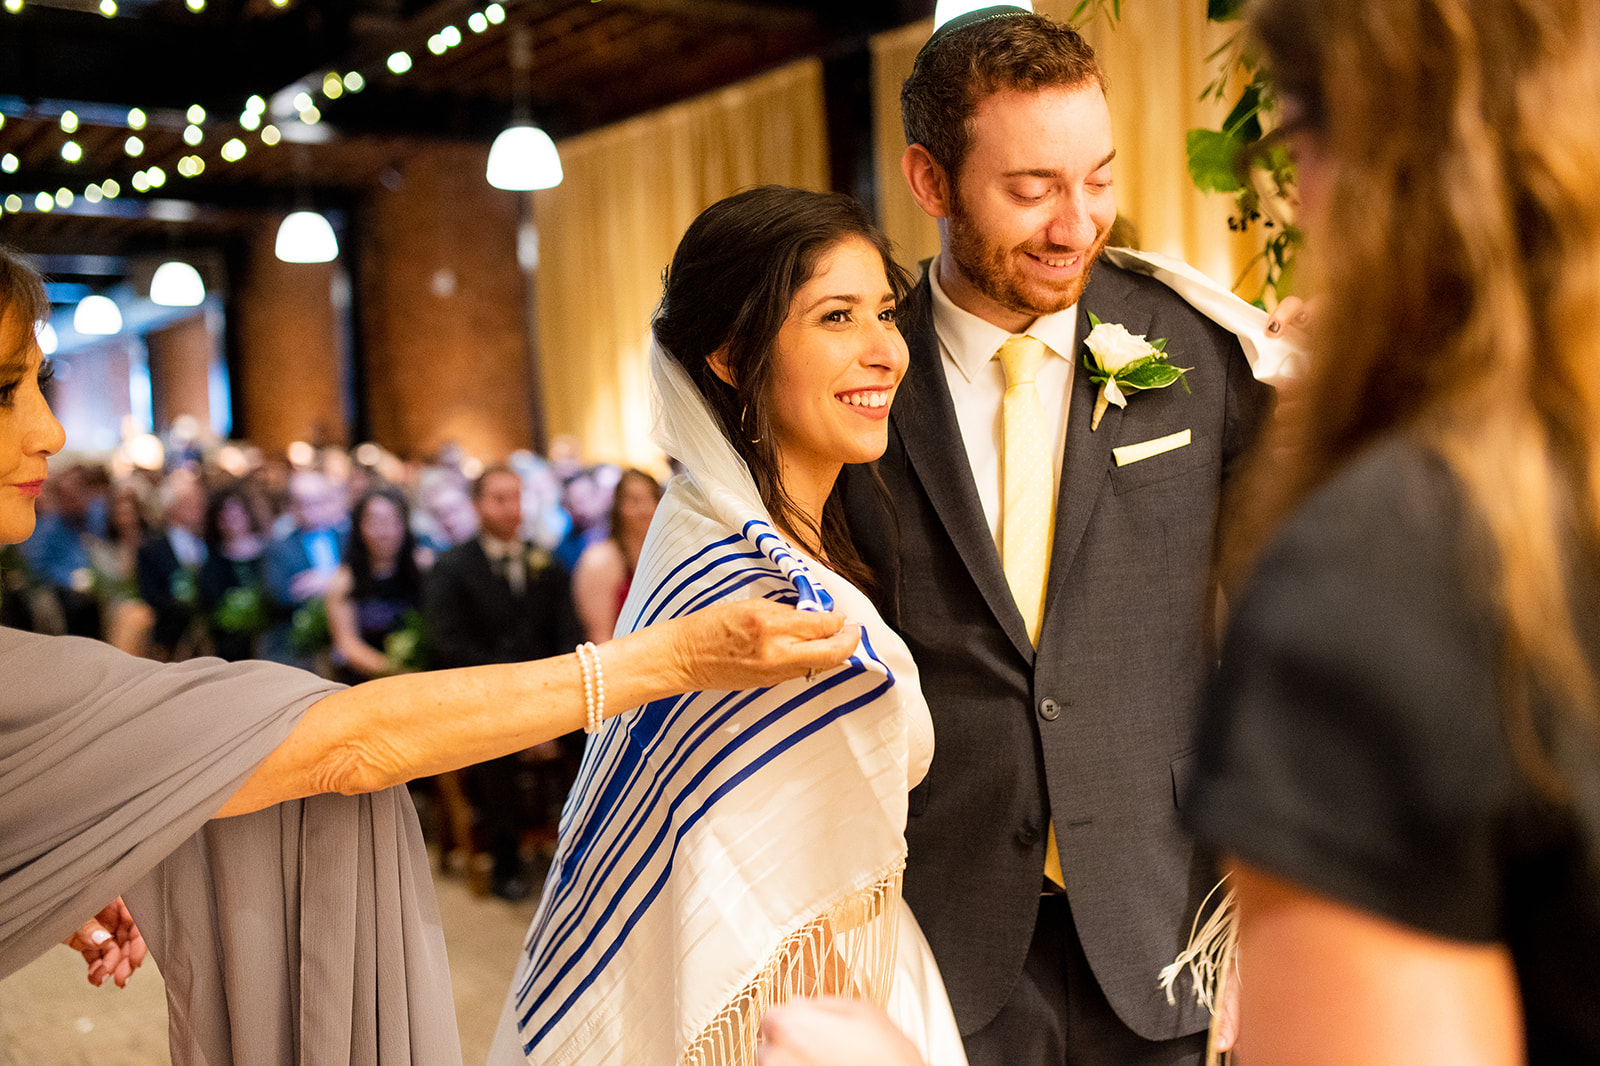 The_best_of_the_best_wedding_photographer_Mantas_Kubilinskas-515.jpg